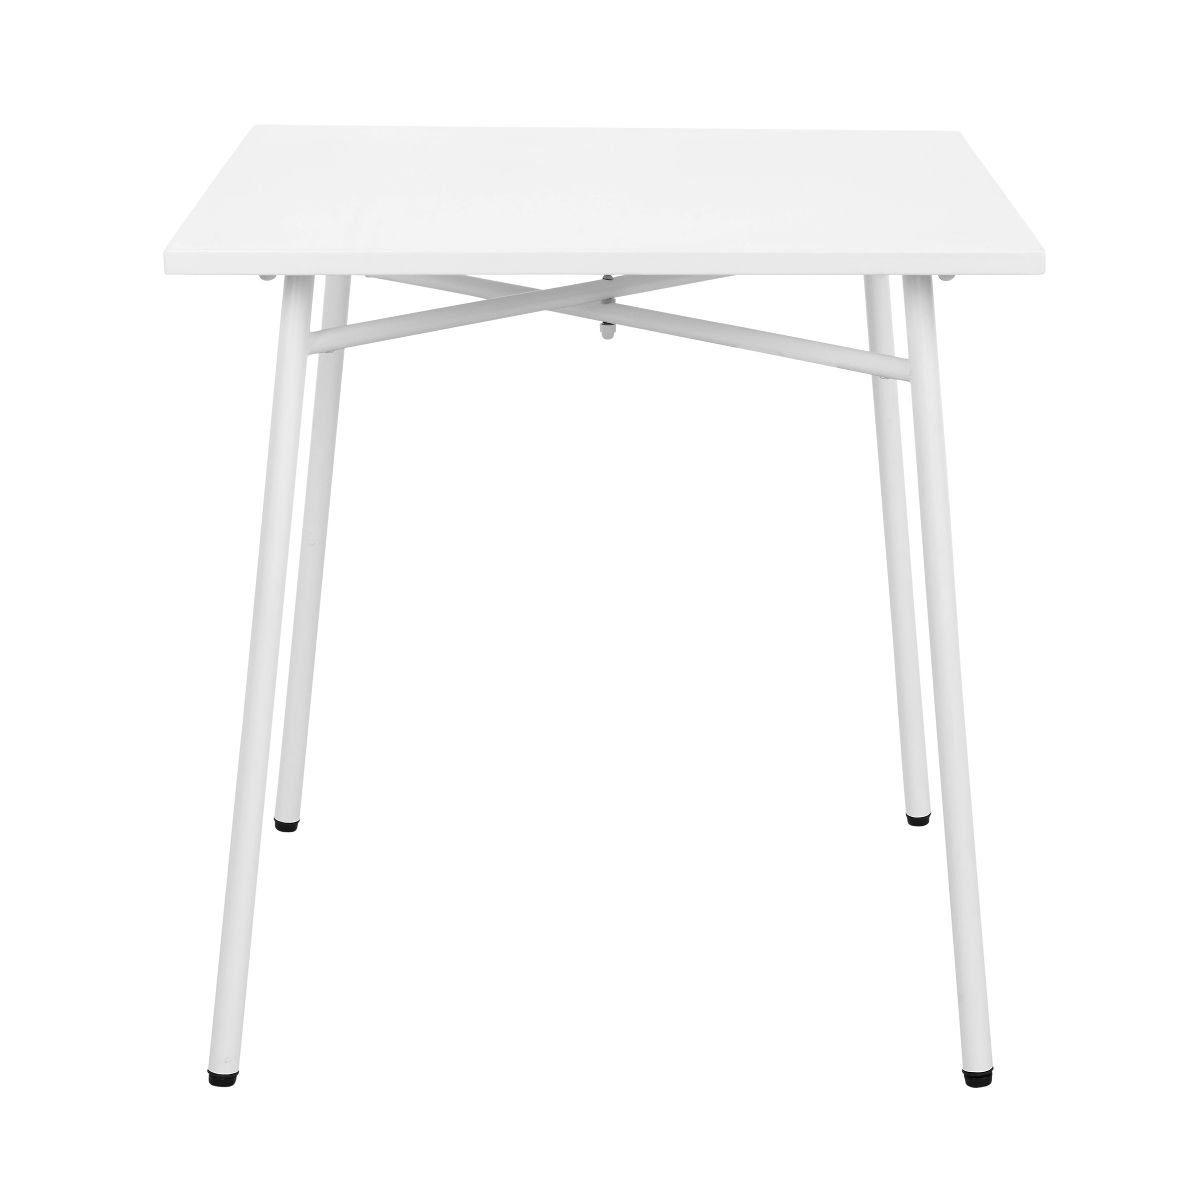 BUTLERS CARREFOUR »Tisch«